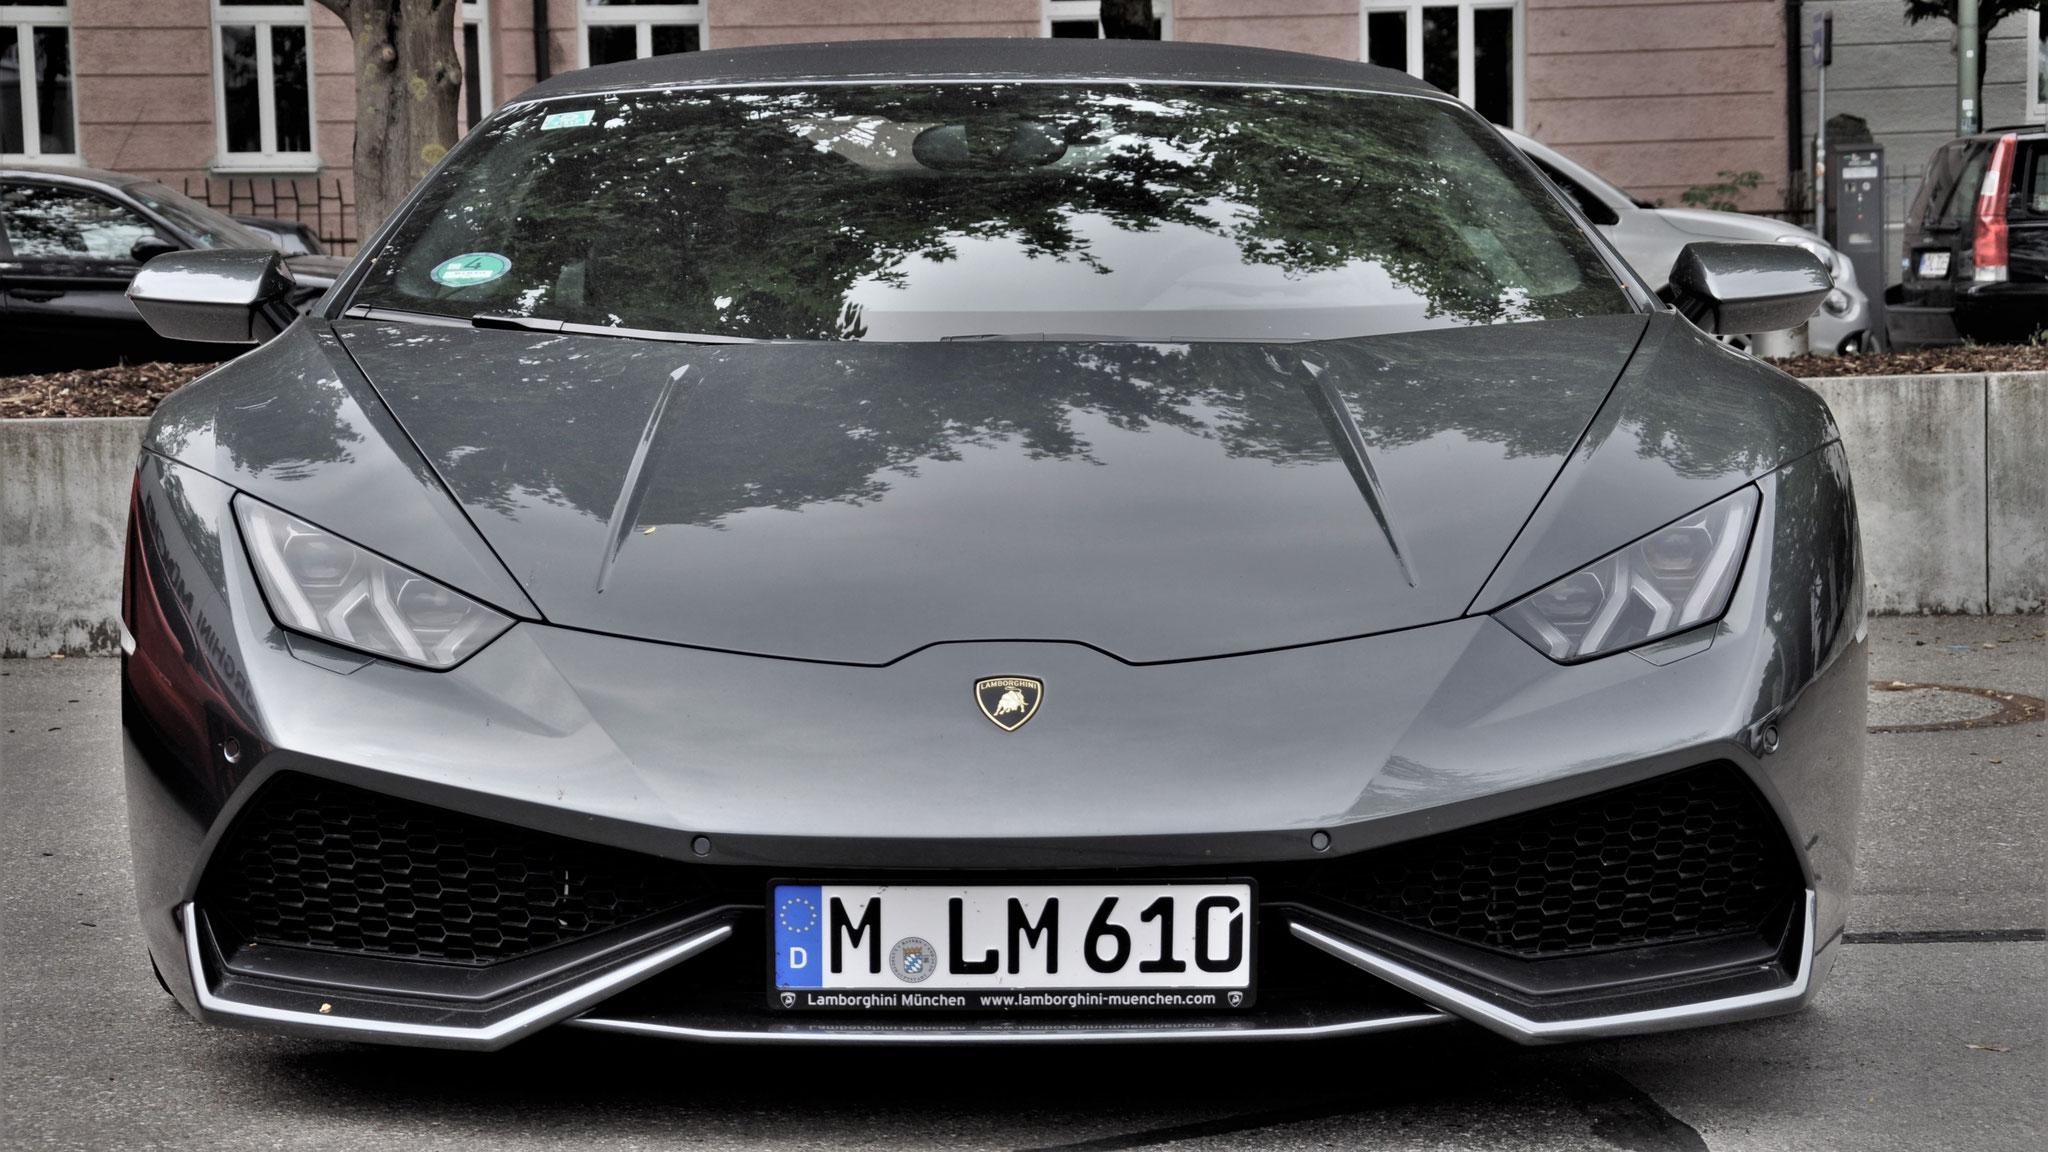 Lamborghini Huracan Spyder - M-LM-610